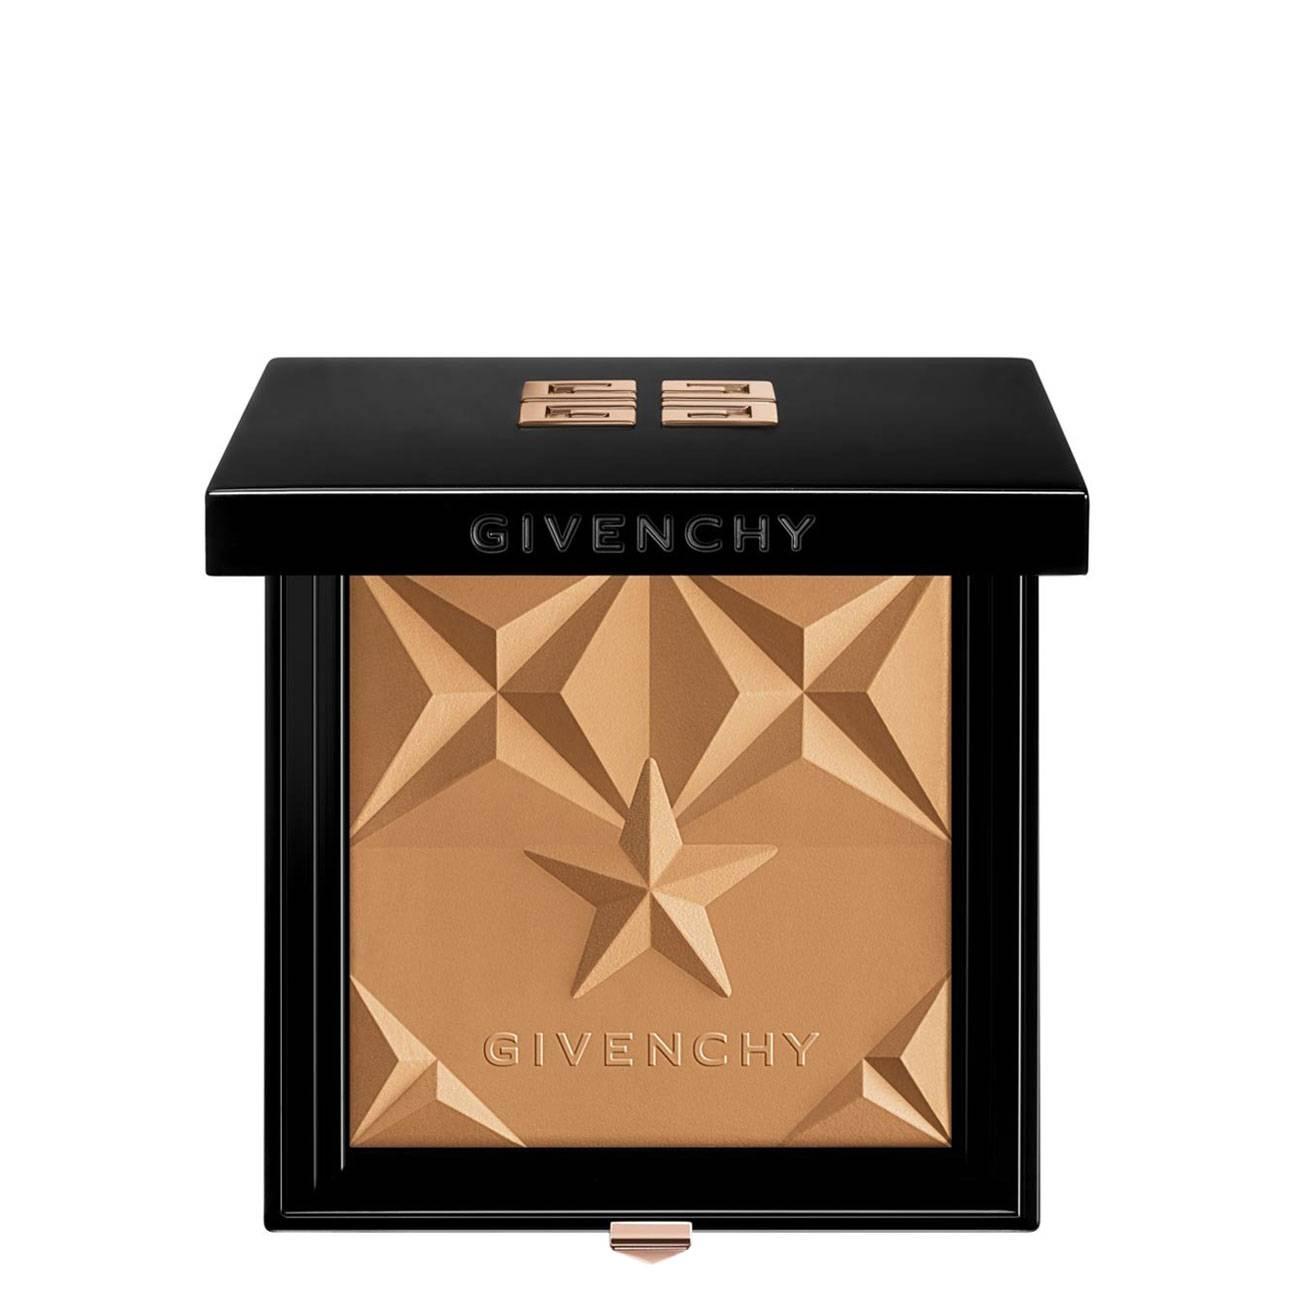 Healthy Glow Powder 10 G Ambre Saison 3 Givenchy imagine 2021 bestvalue.eu